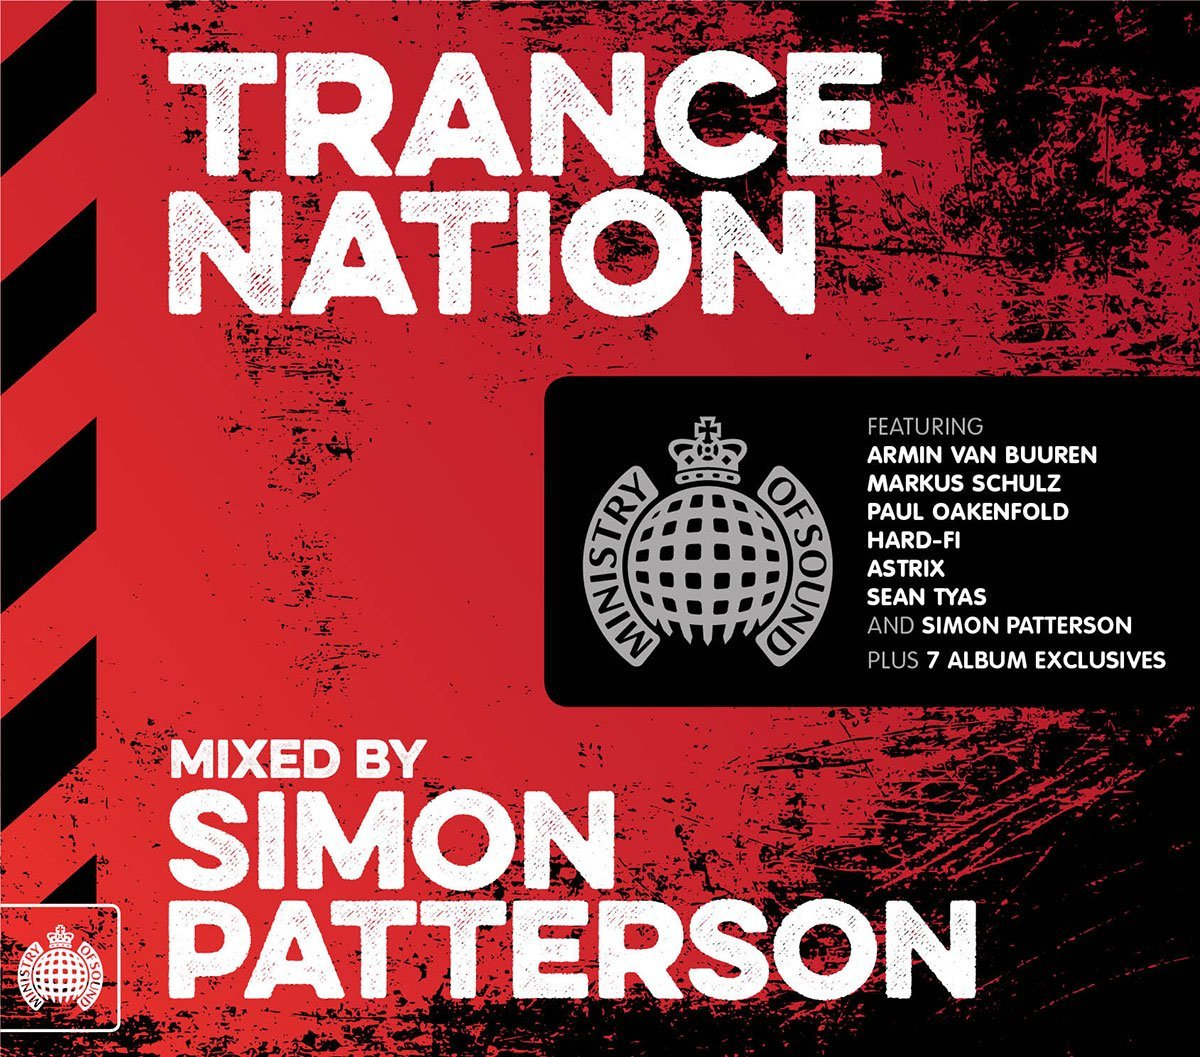 Simon Patterson Trance Nation Album 2015